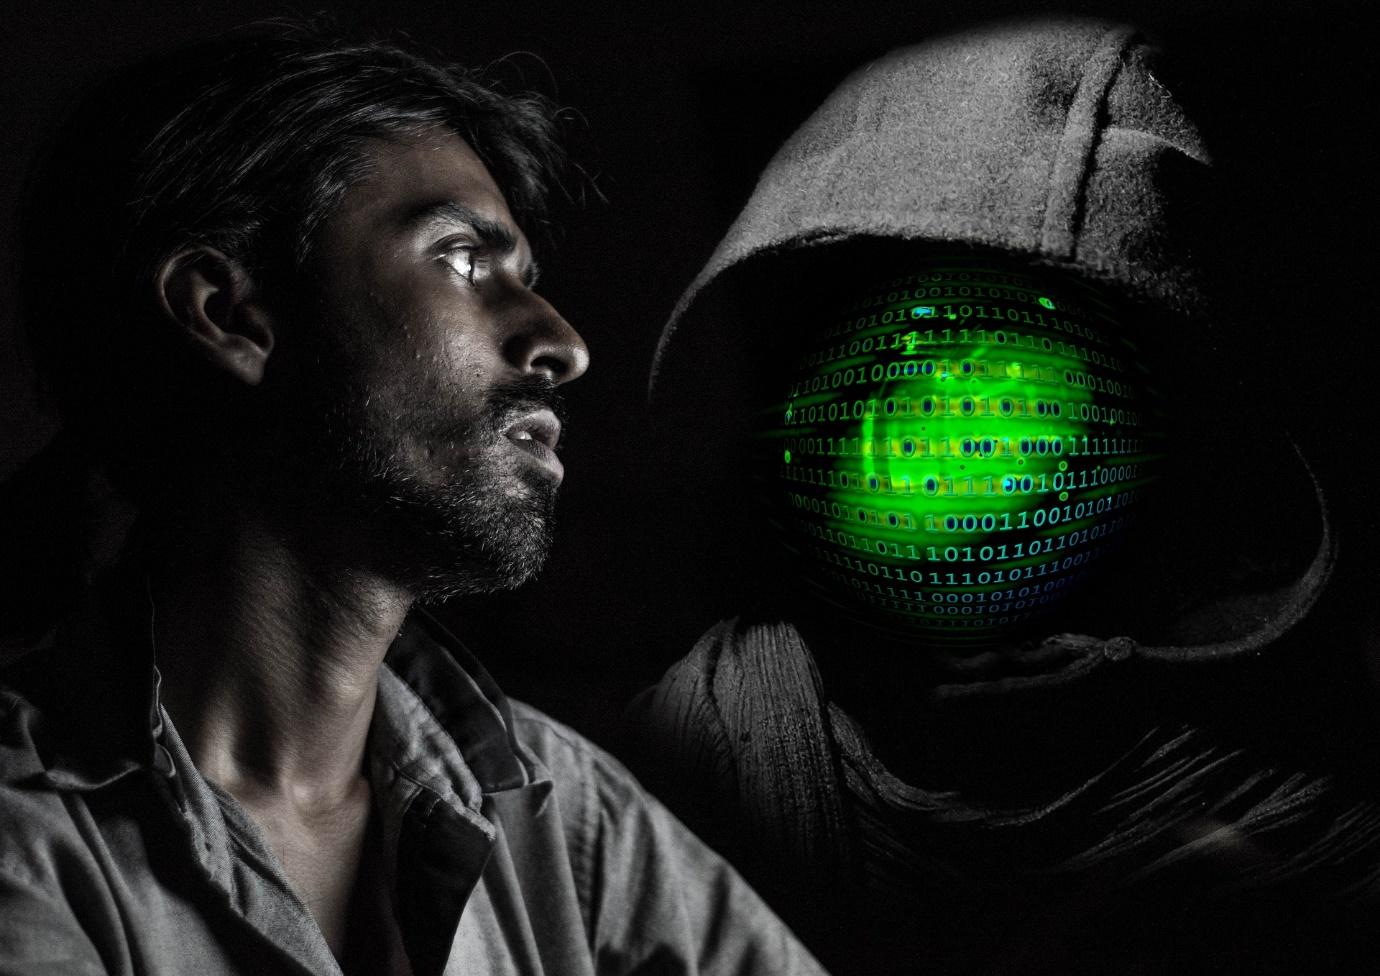 Face Hood Hacker